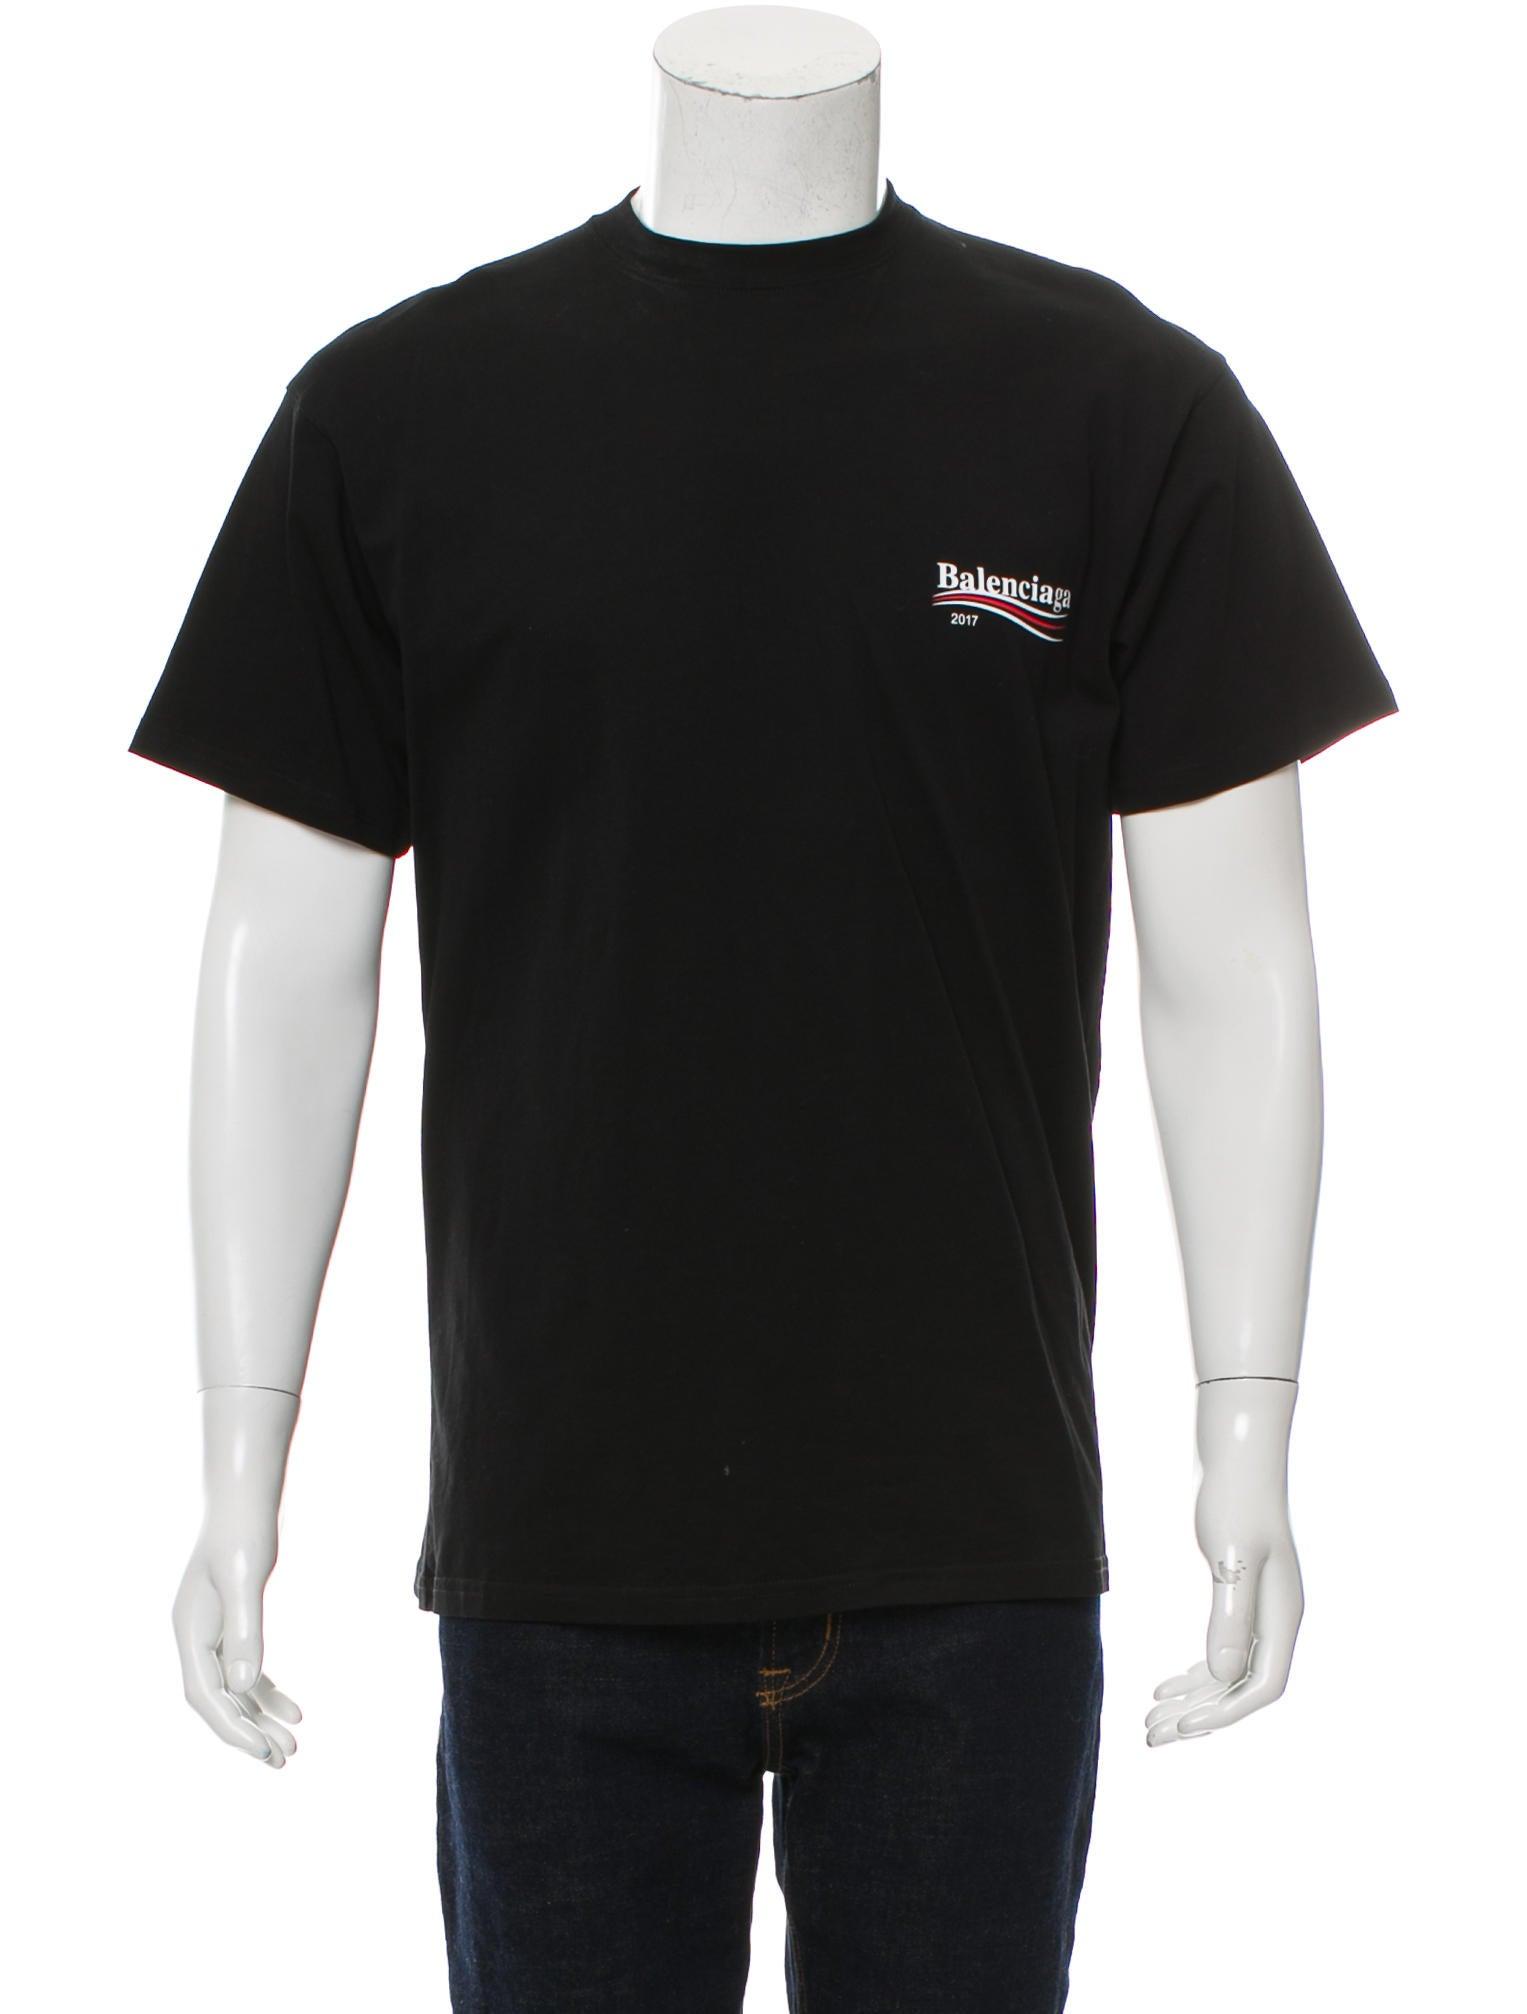 balenciaga t shirt 2017